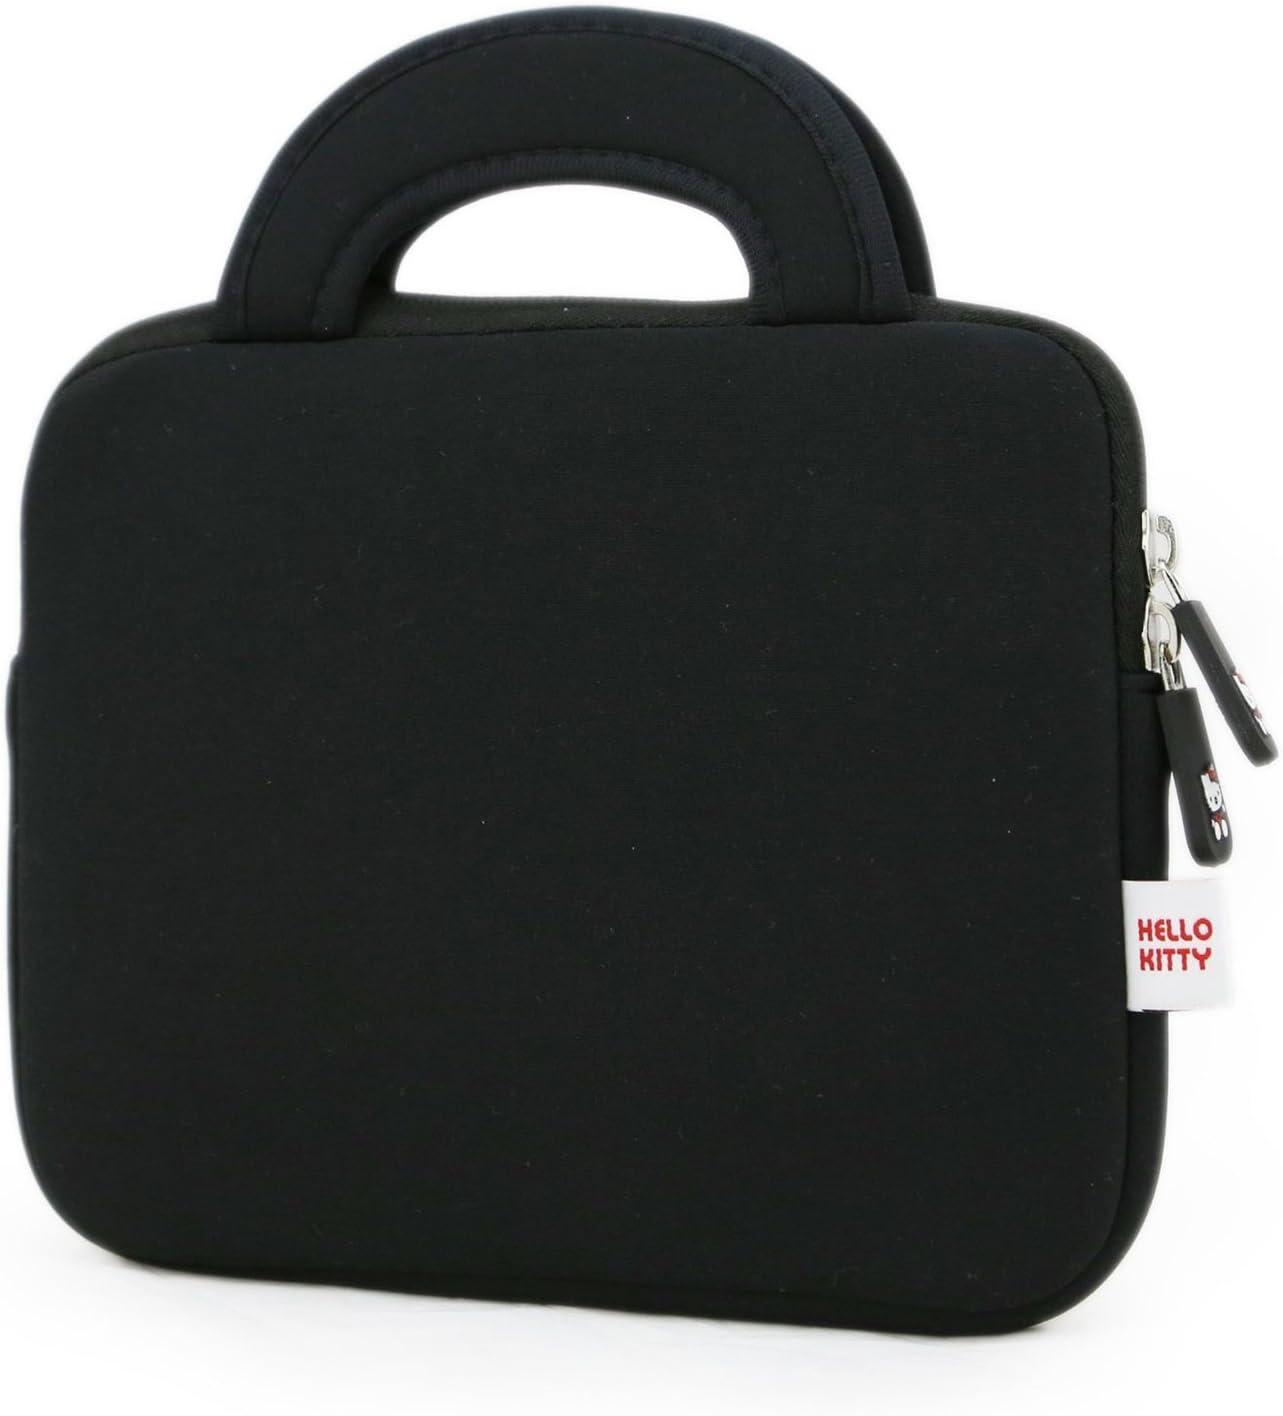 Black Phenix-Color Hello Kitty Little Bear Bag Sleeve Case for Ipad 2 3 4 // iPad Air // iPad Air2 Google Nexus Hp Touchpad Motorola Xoom and any 10.1inch or less Tablet Smasung Galaxy Tab 10.1V